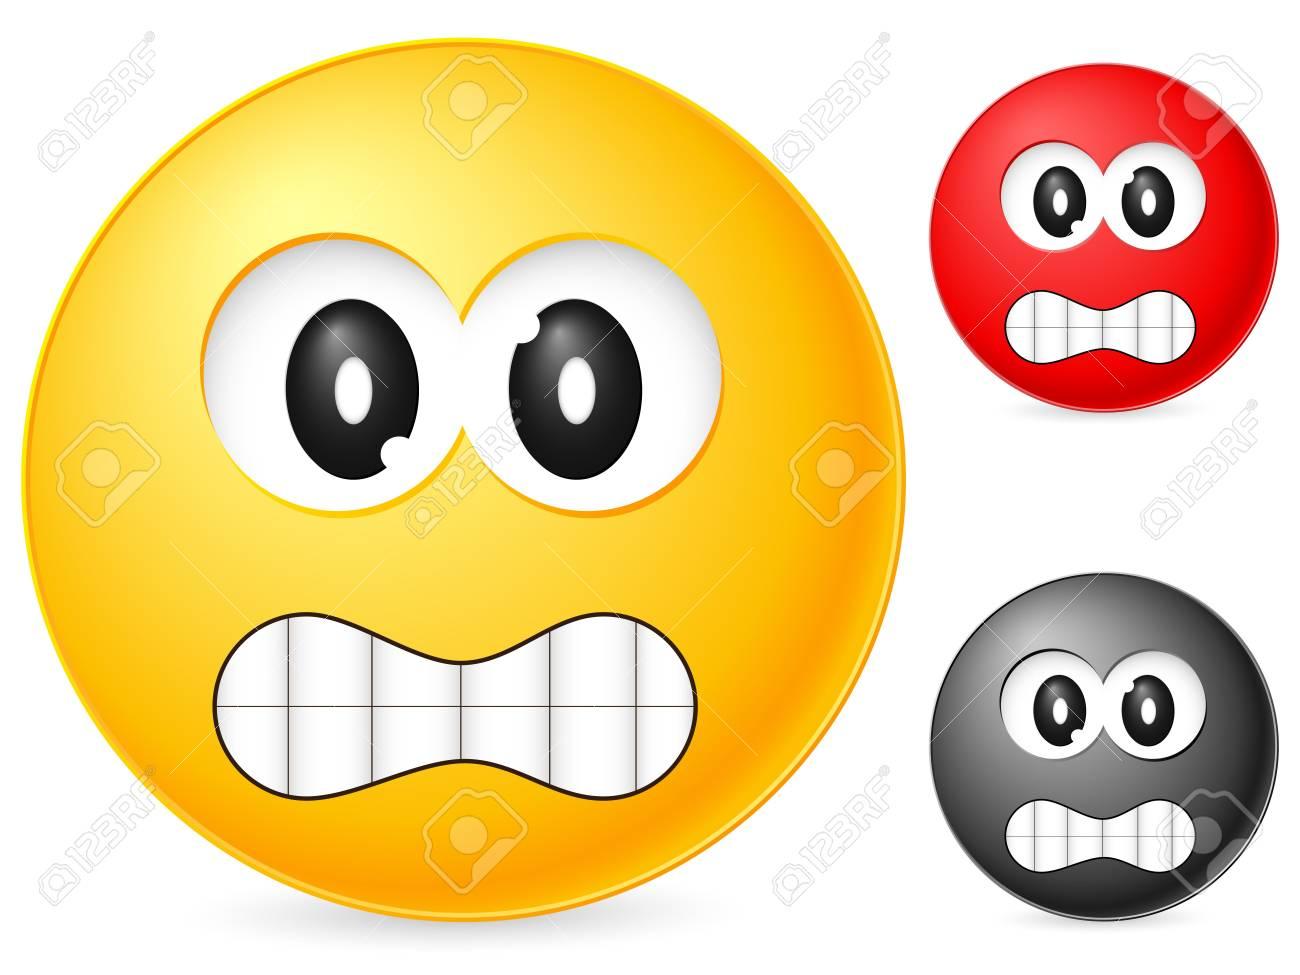 Emoticon isolated on white background. Vector illustration. Stock Illustration - 6231772